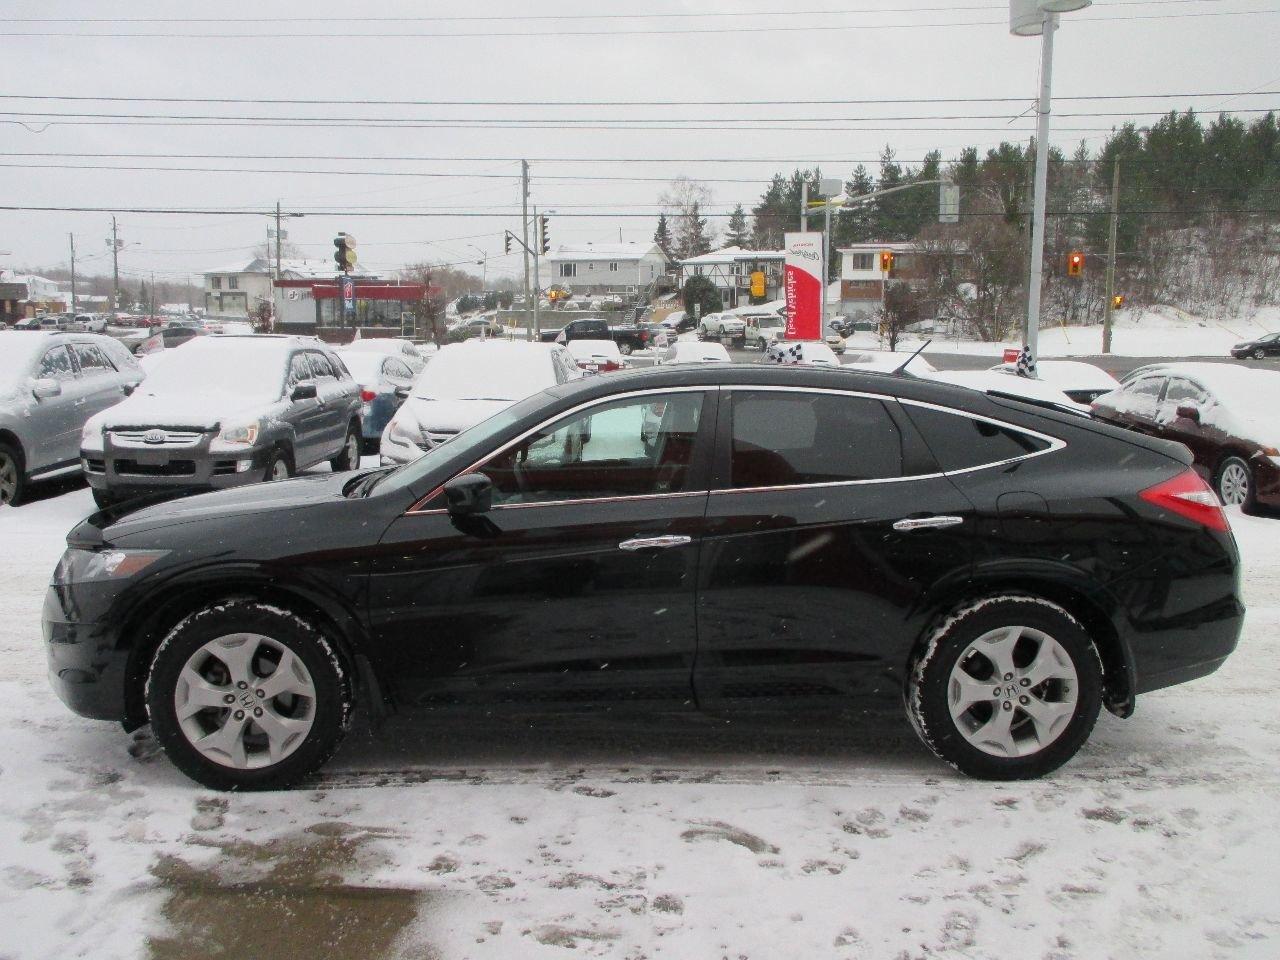 Pre Owned Vehicles In Sudbury Palladino Honda In Sudbury Ontario